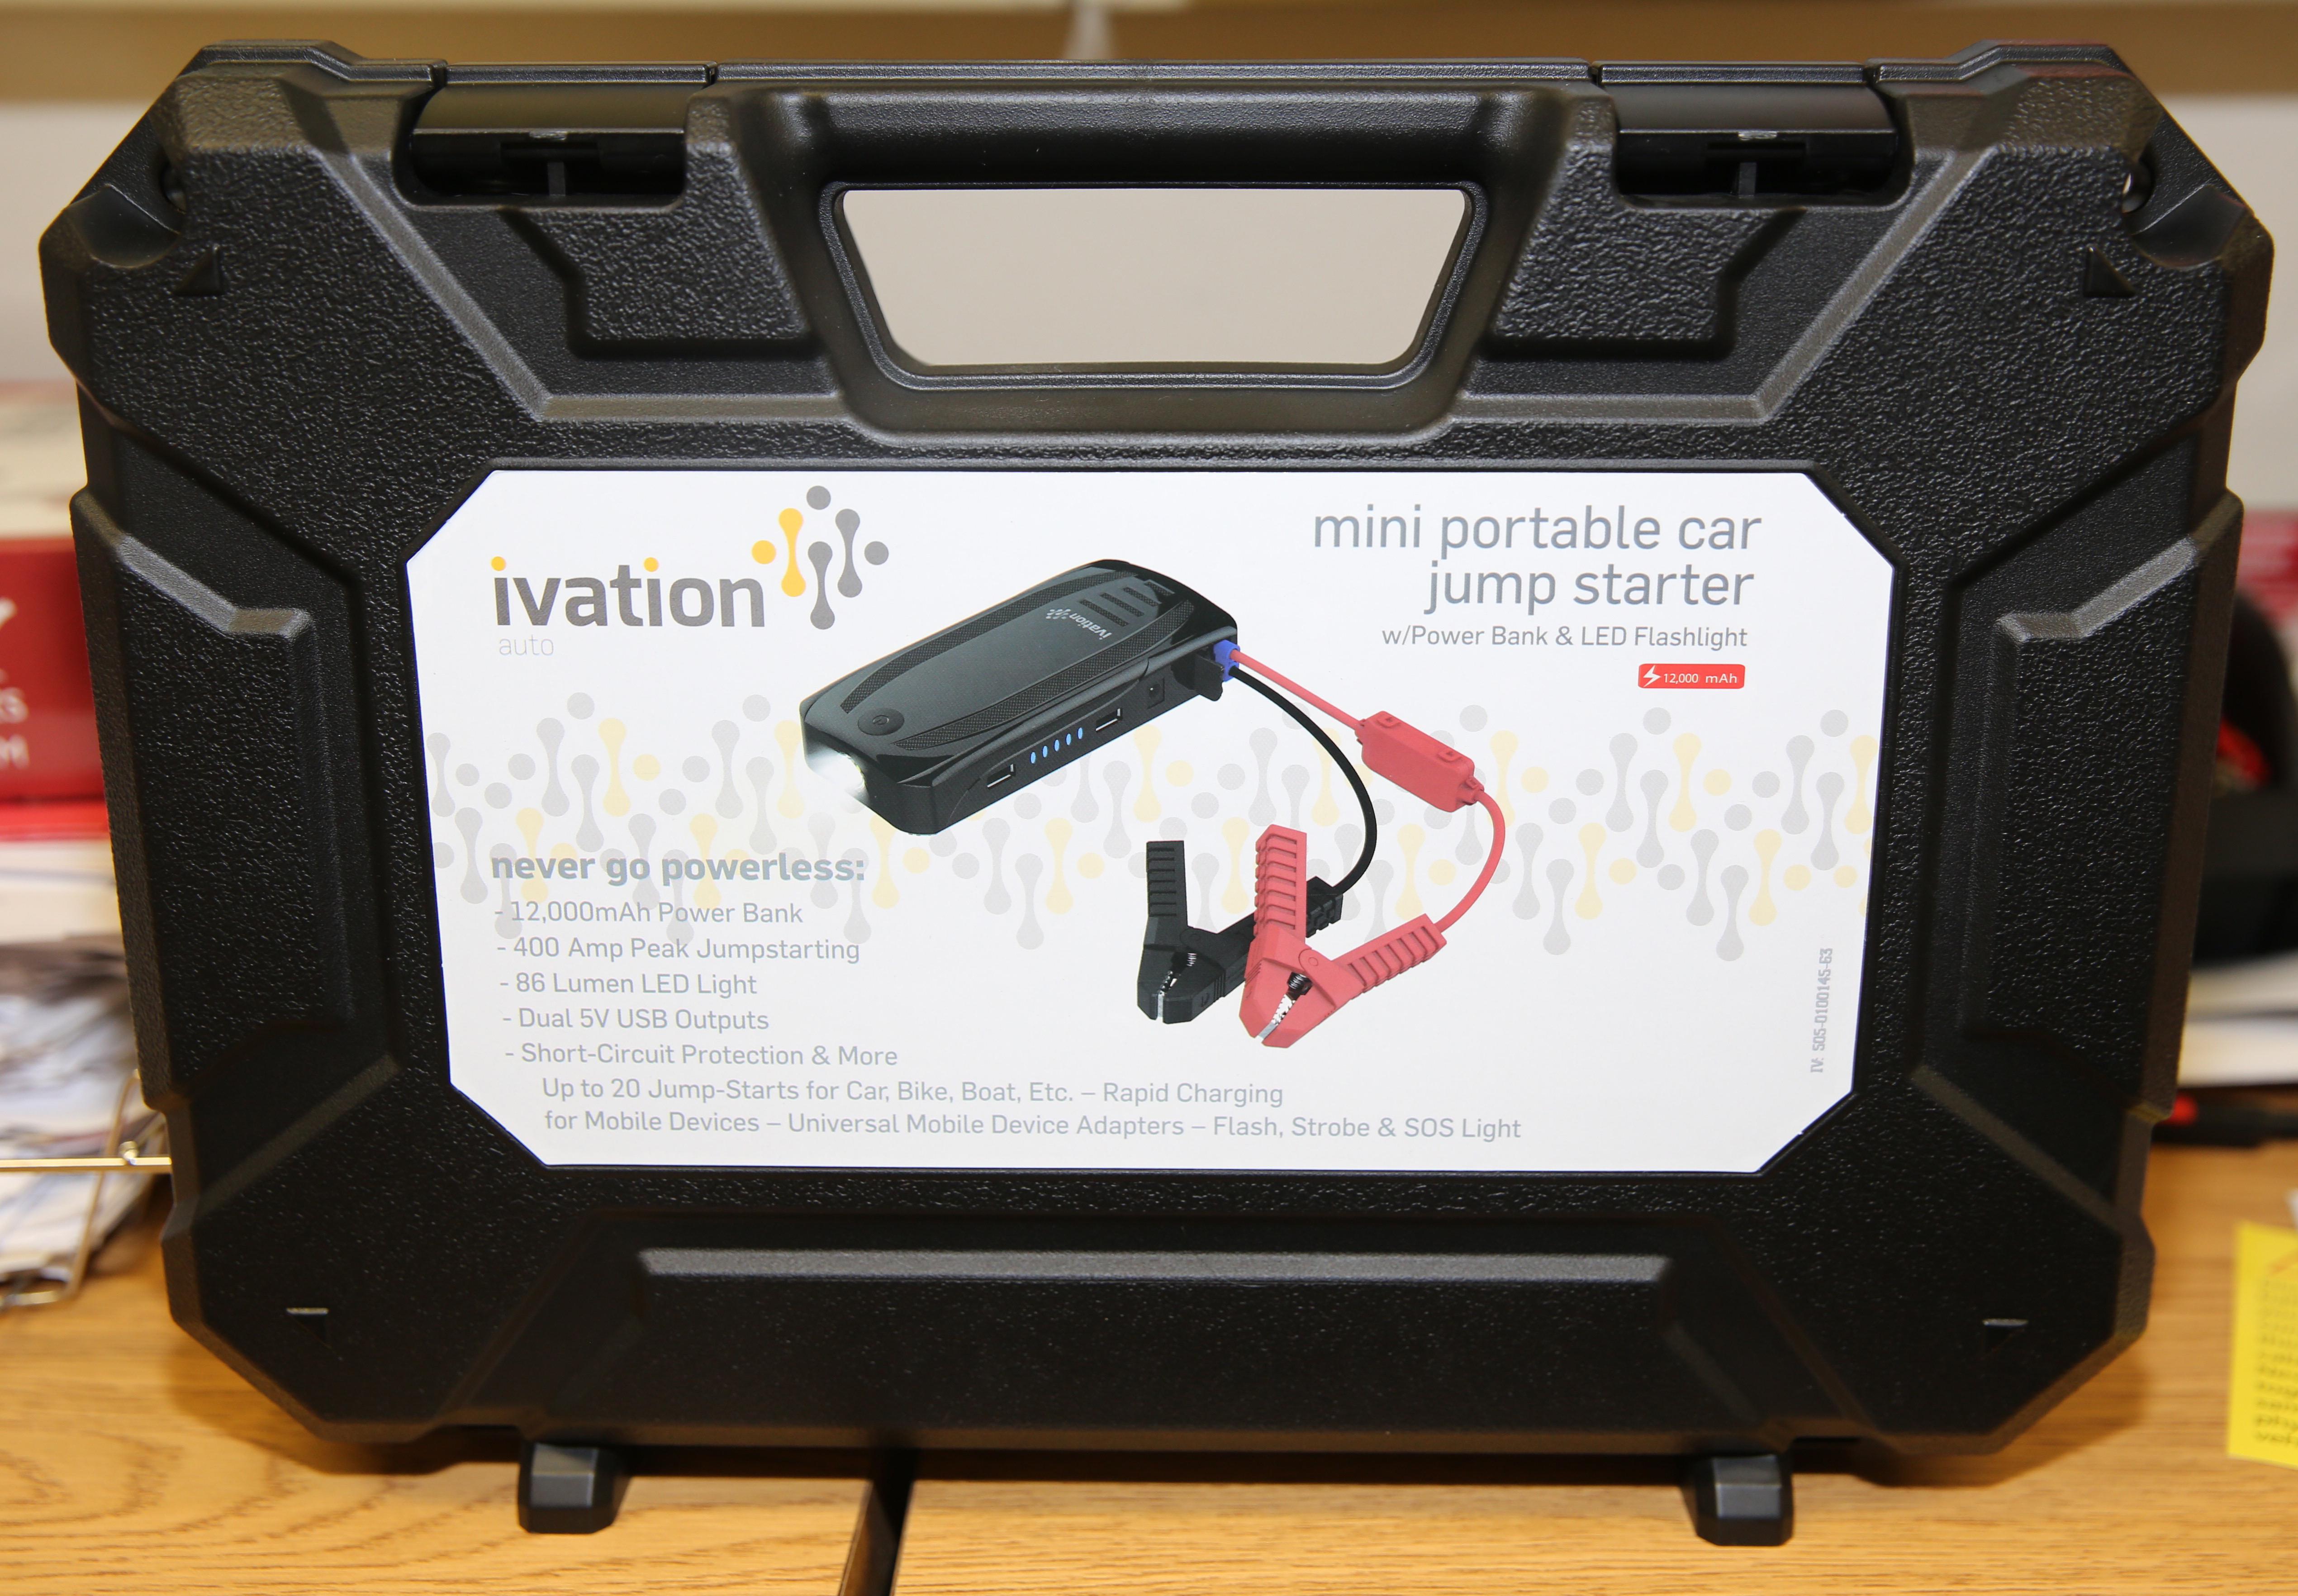 Ivation Mini Portable Car Jump Starter Power Bank Mooserve Reviews